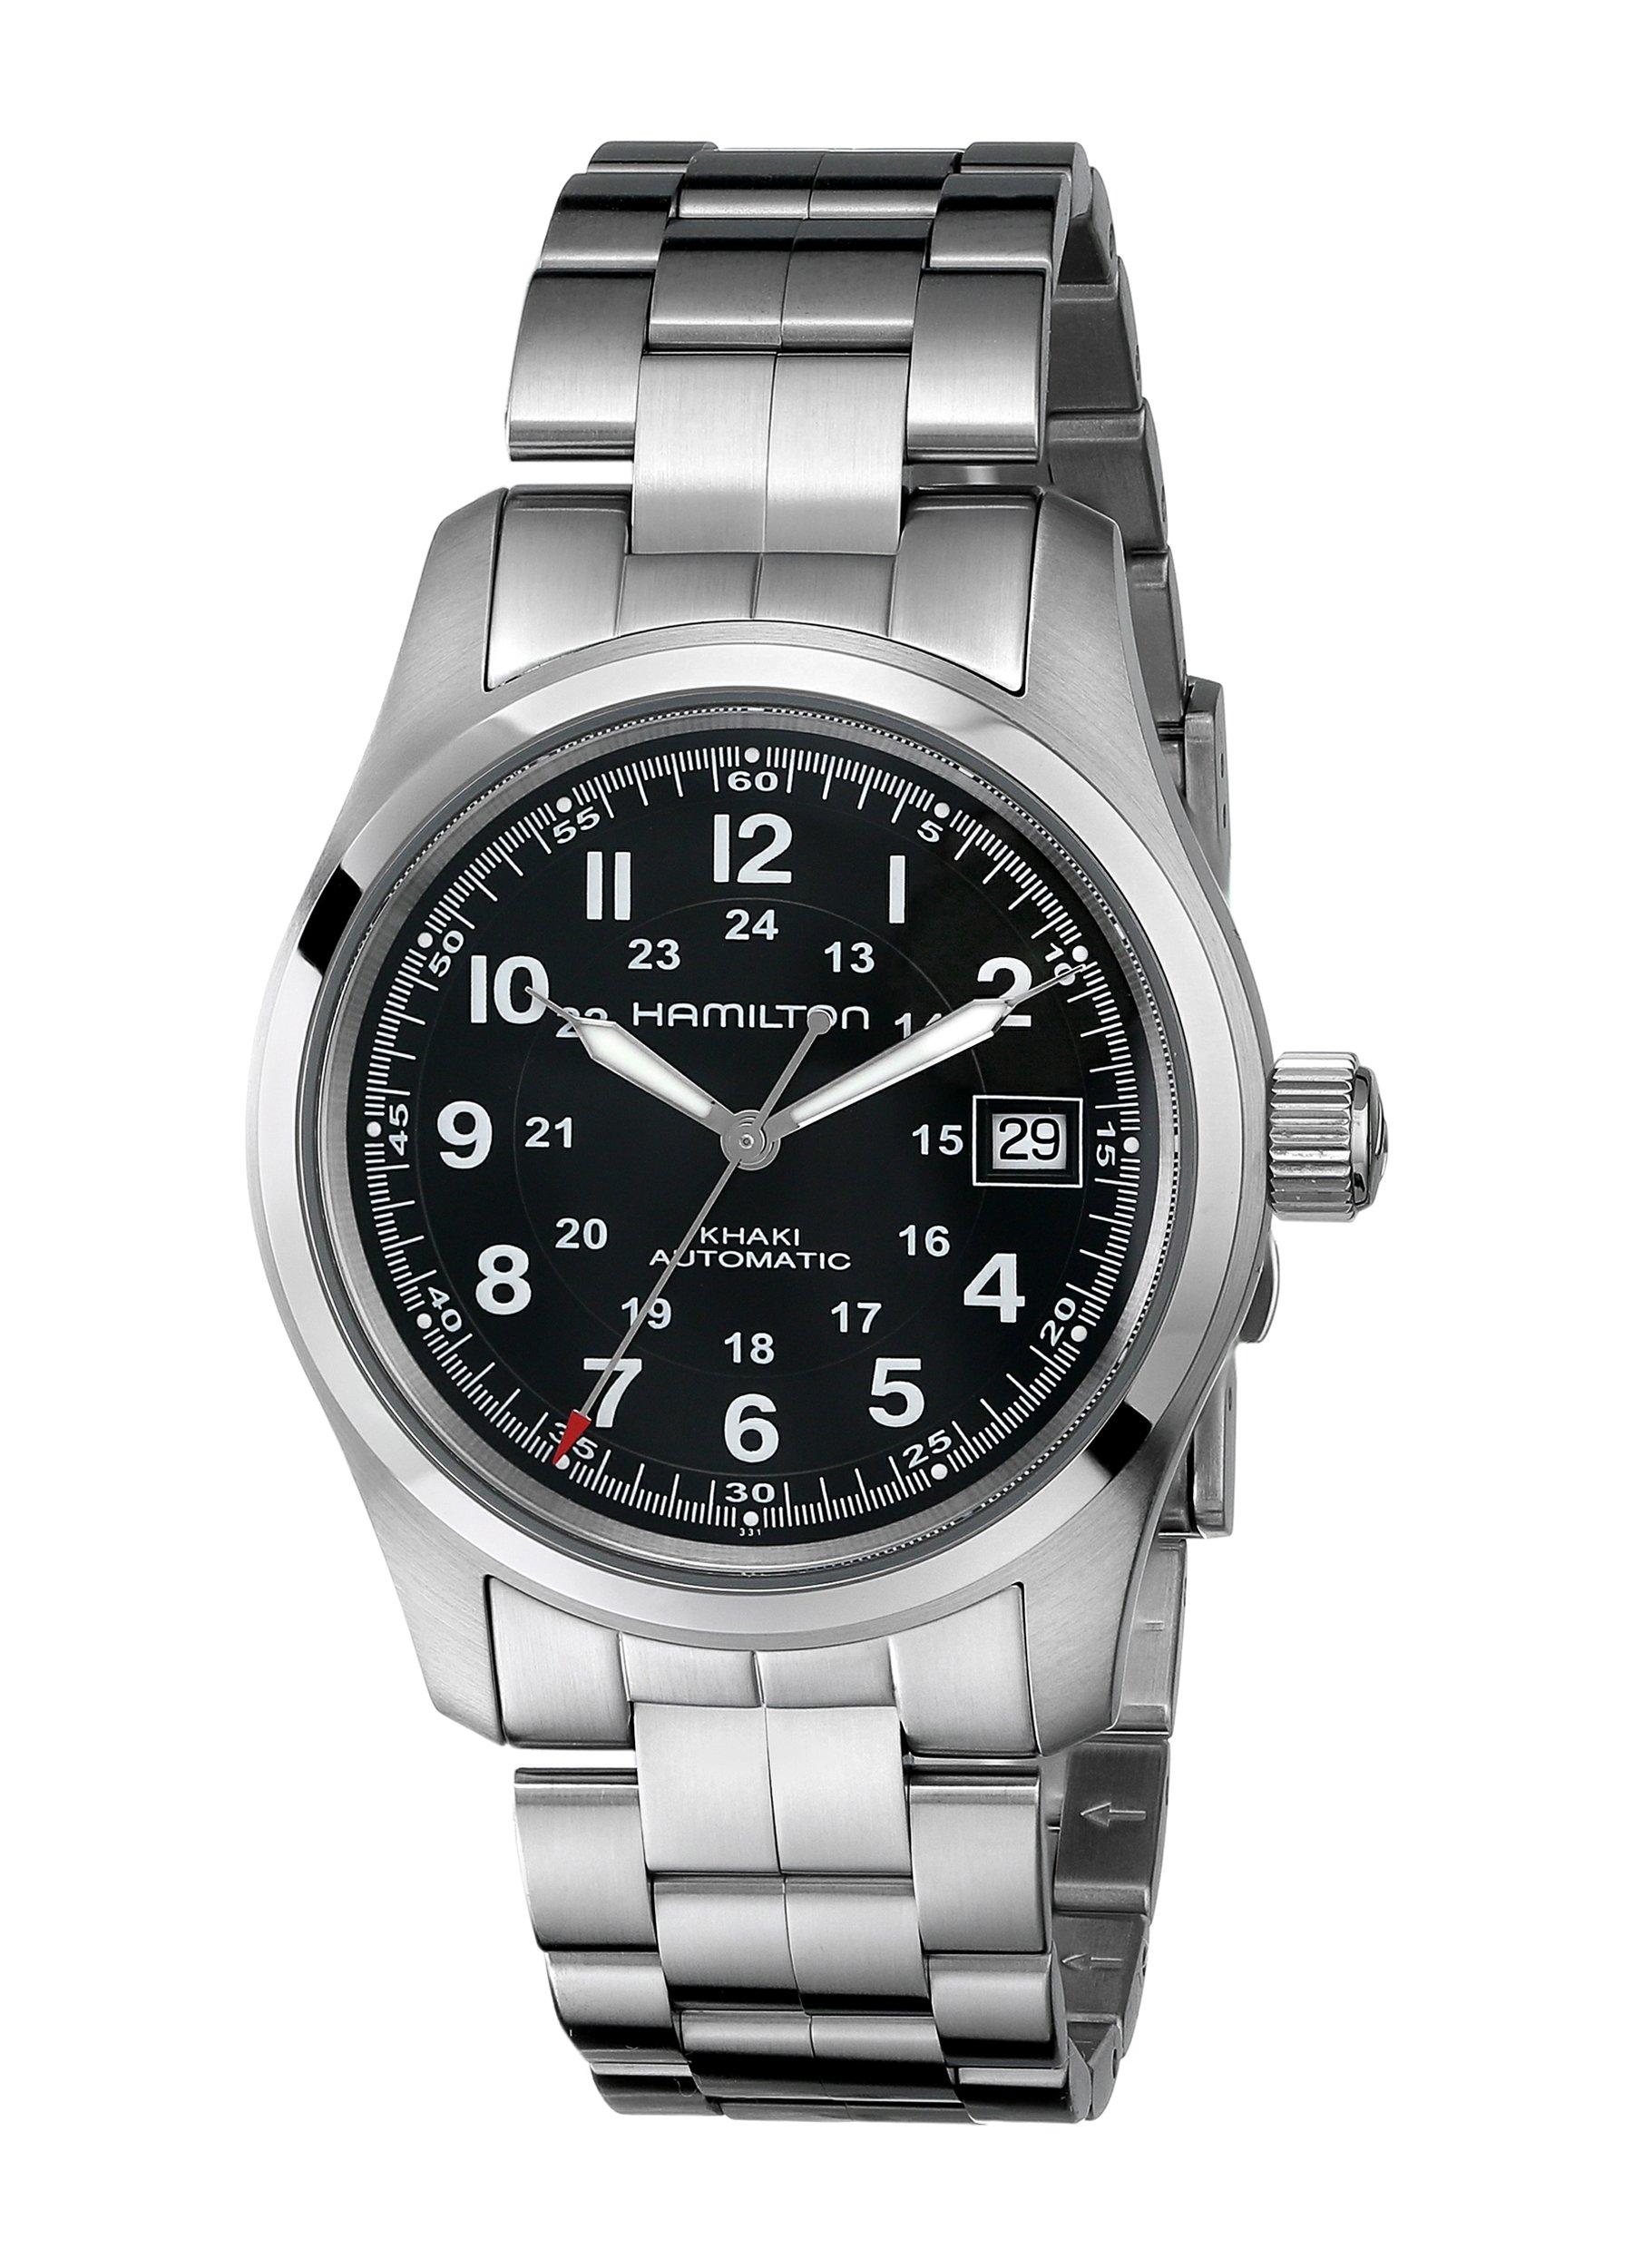 Hamilton Men's Analogue Automatic Watch – H70455133